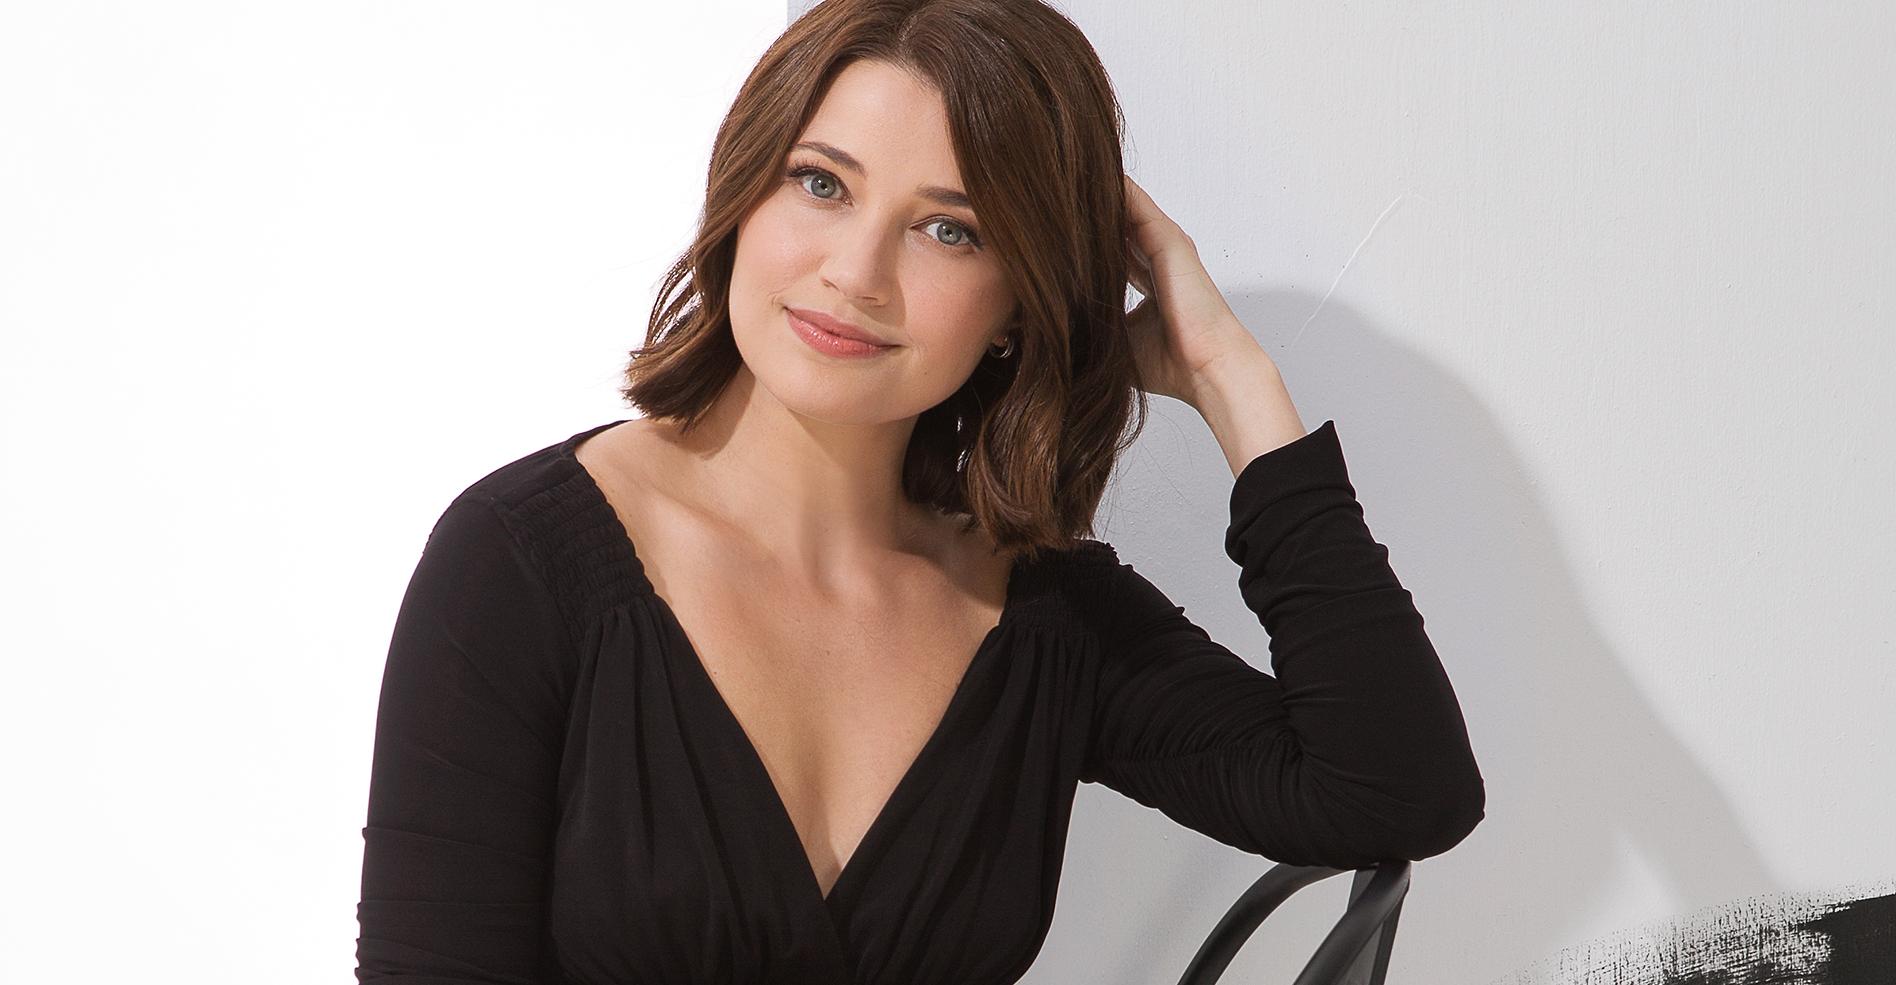 Amanda Seevers